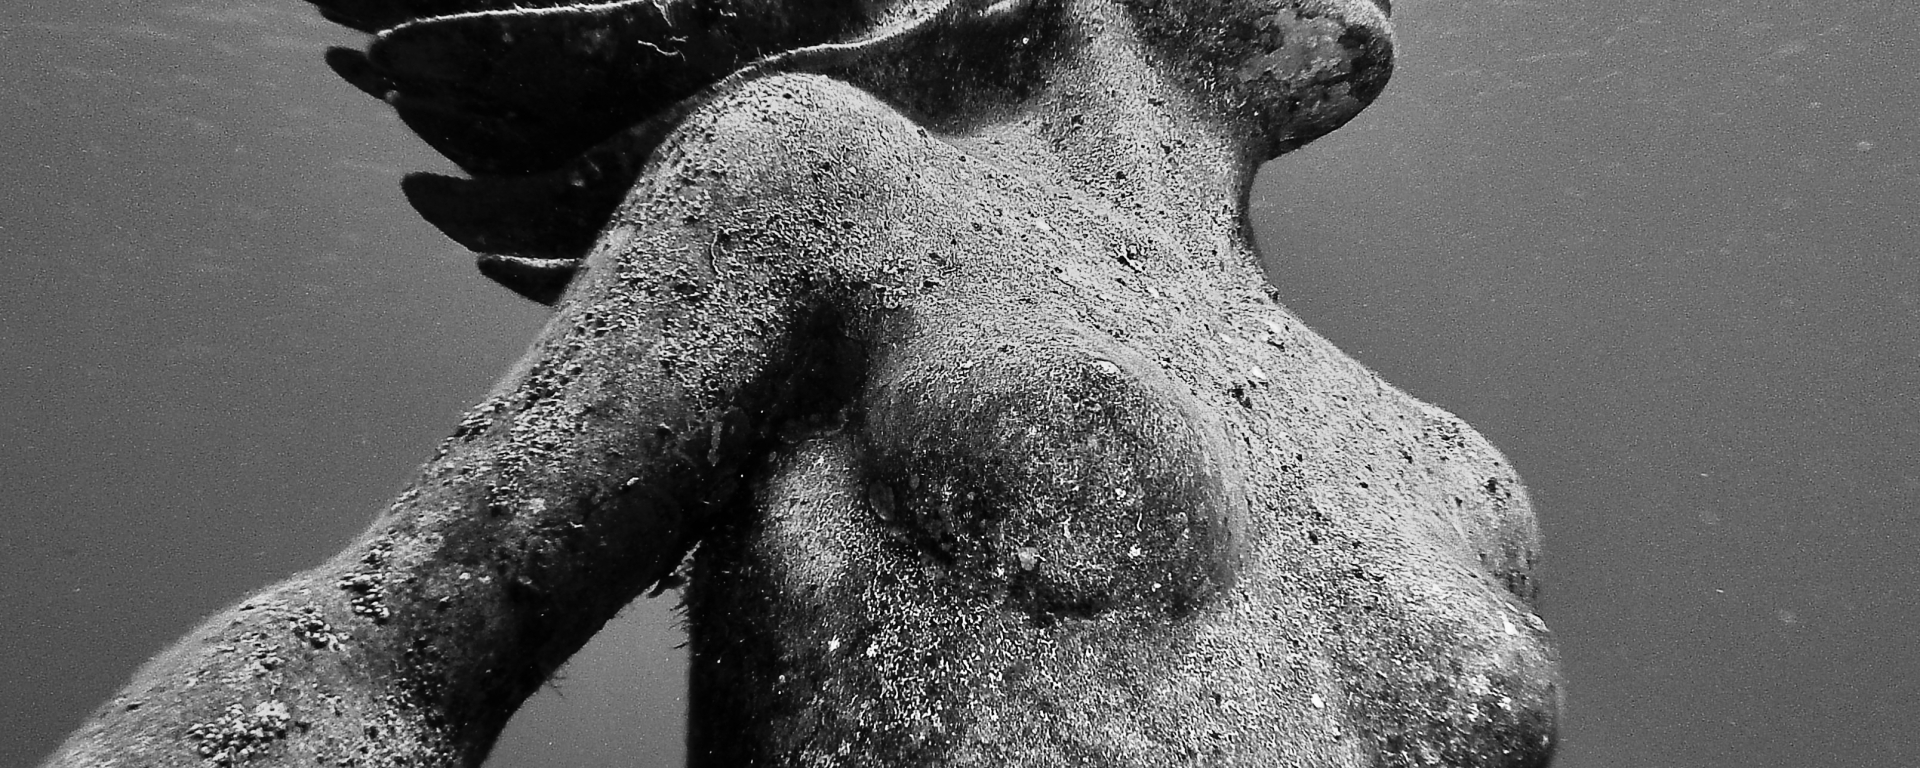 Underwater Mermaid statue, Amphitrite off the coast of Grand Cayman